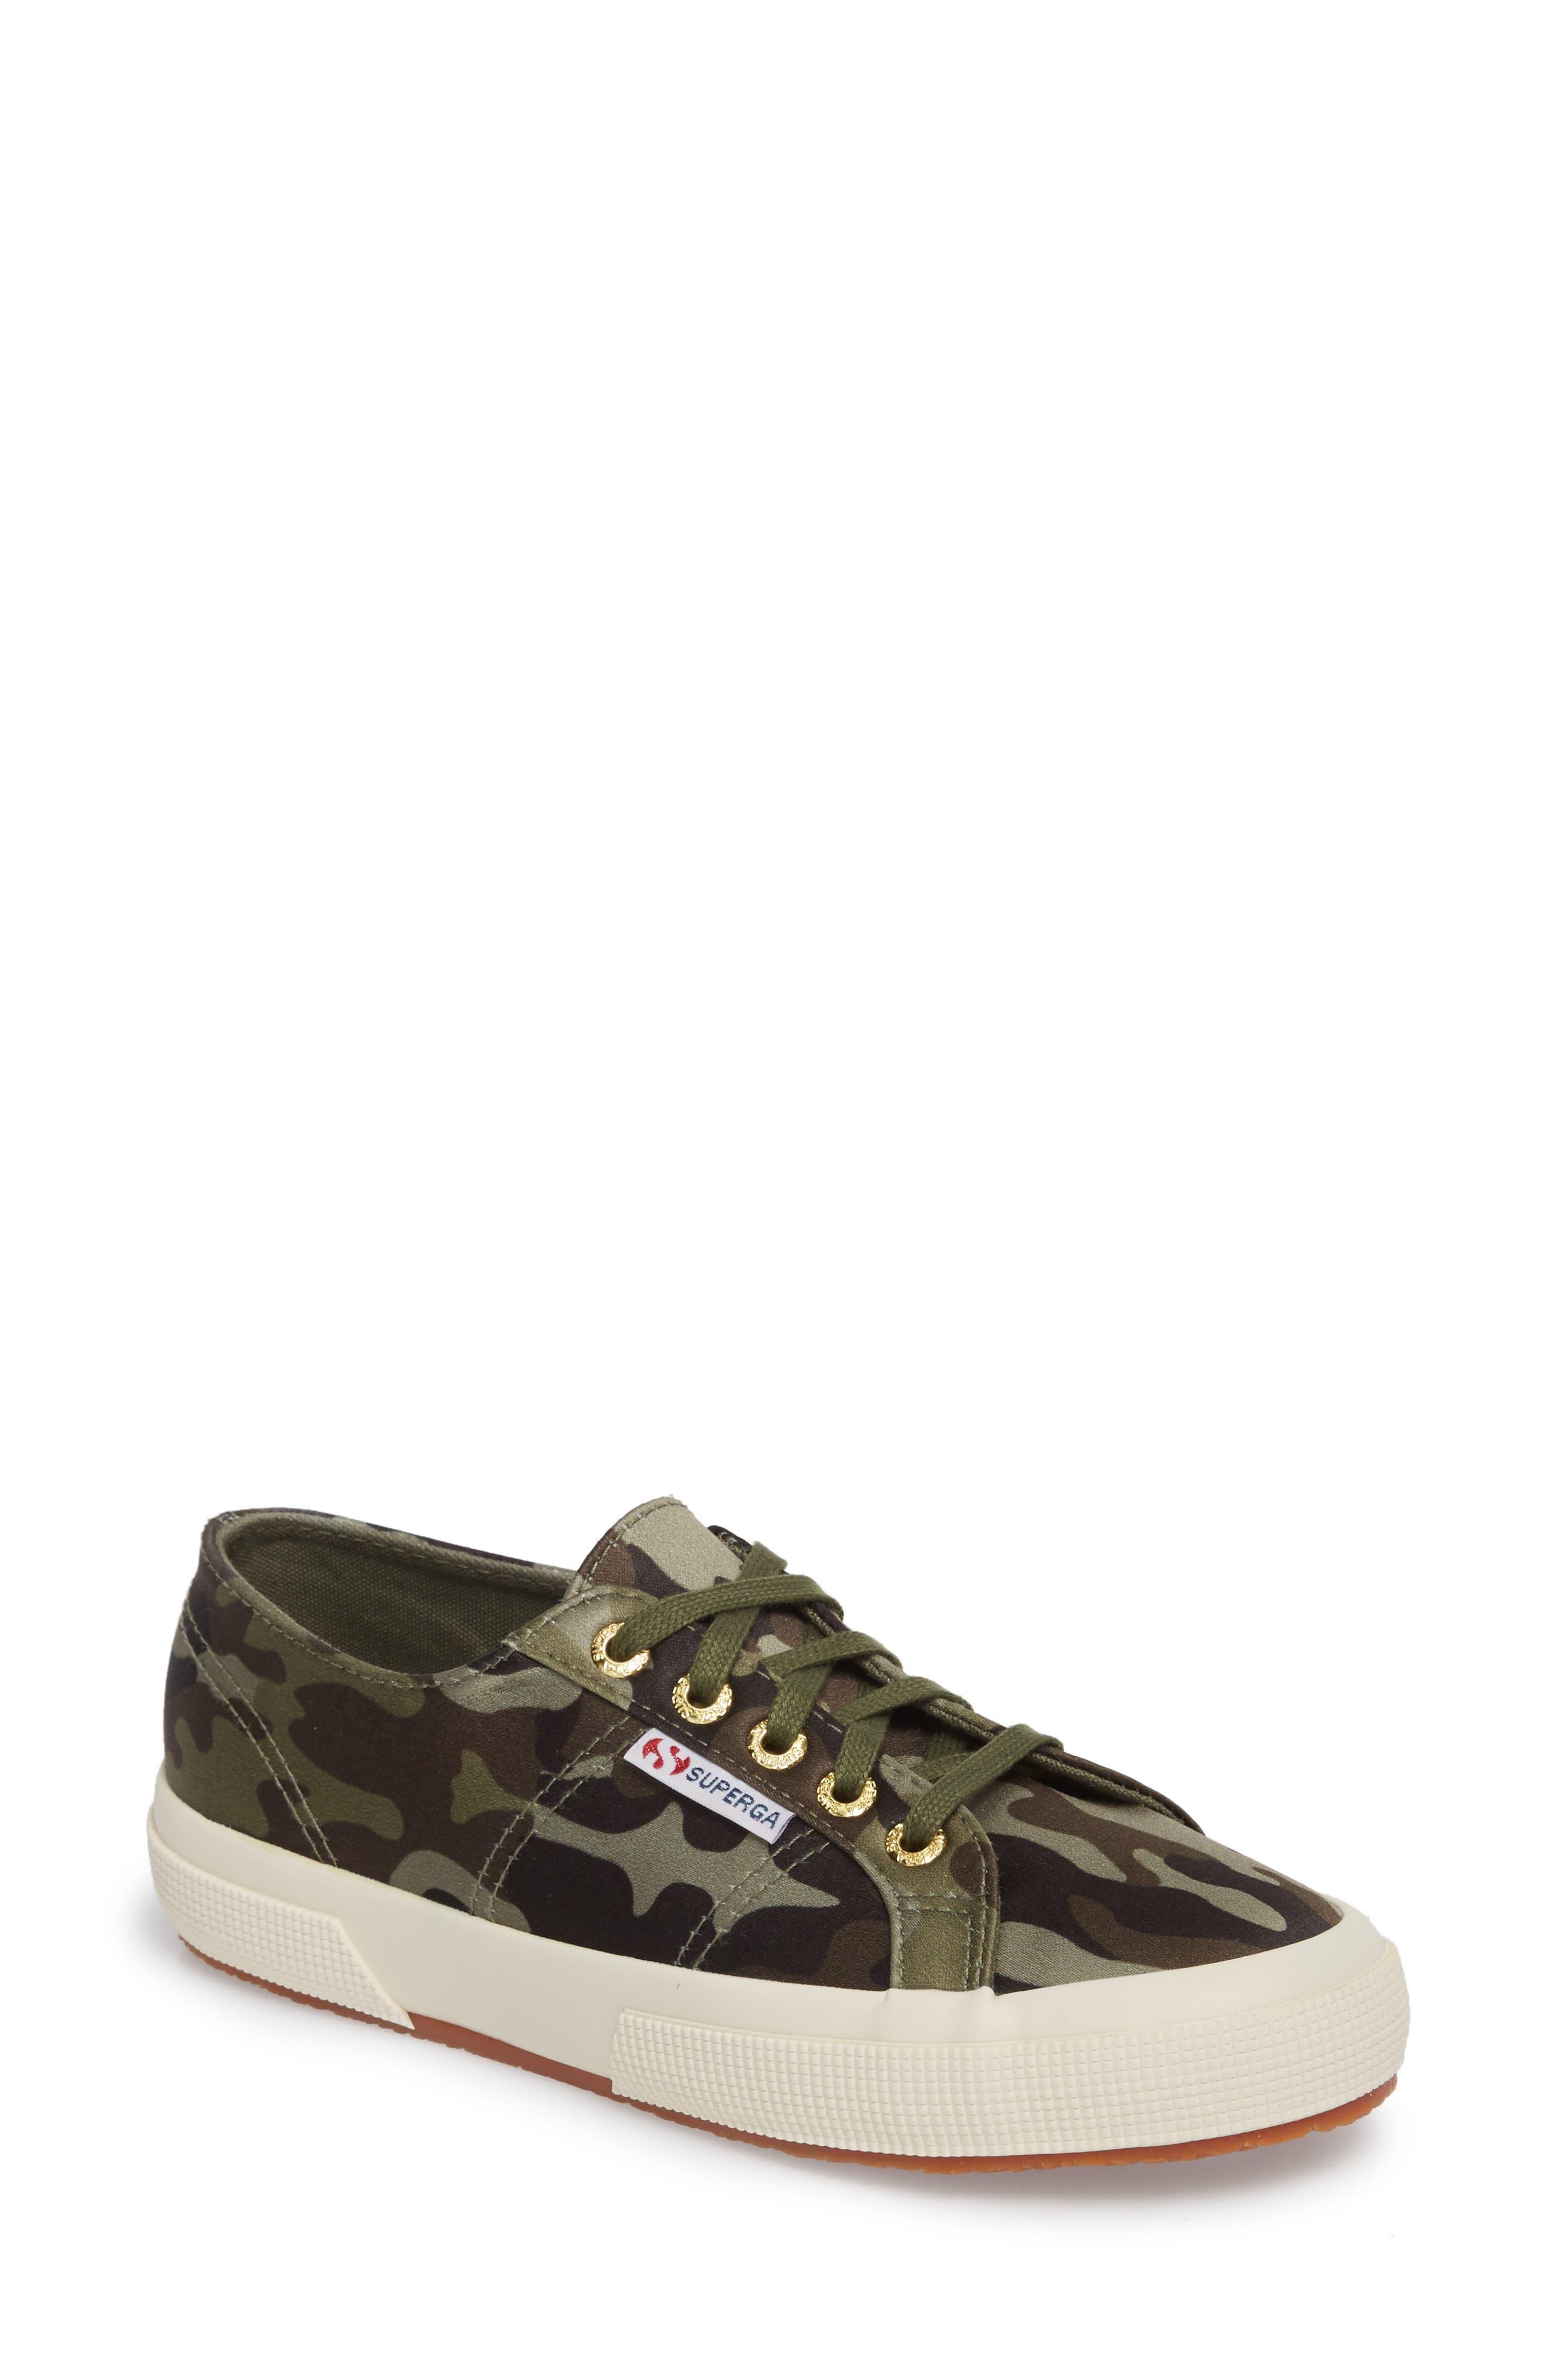 Alternate Image 1 Selected - Superga 2750 Sneaker (Women)